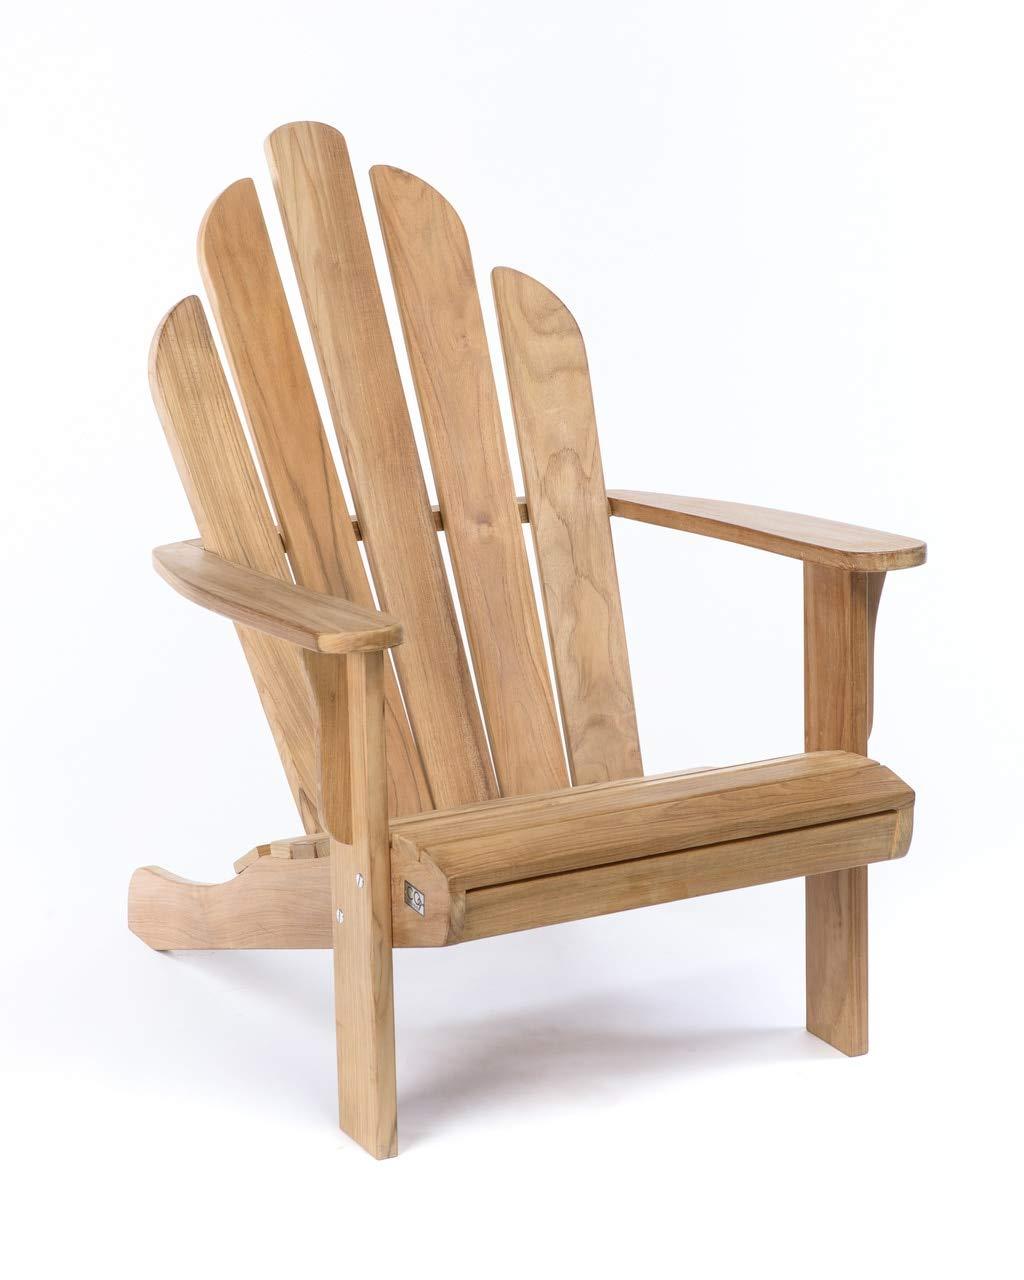 Magnificent Amazon Com Dwell Out Adirondack Chair Garden Outdoor Download Free Architecture Designs Rallybritishbridgeorg